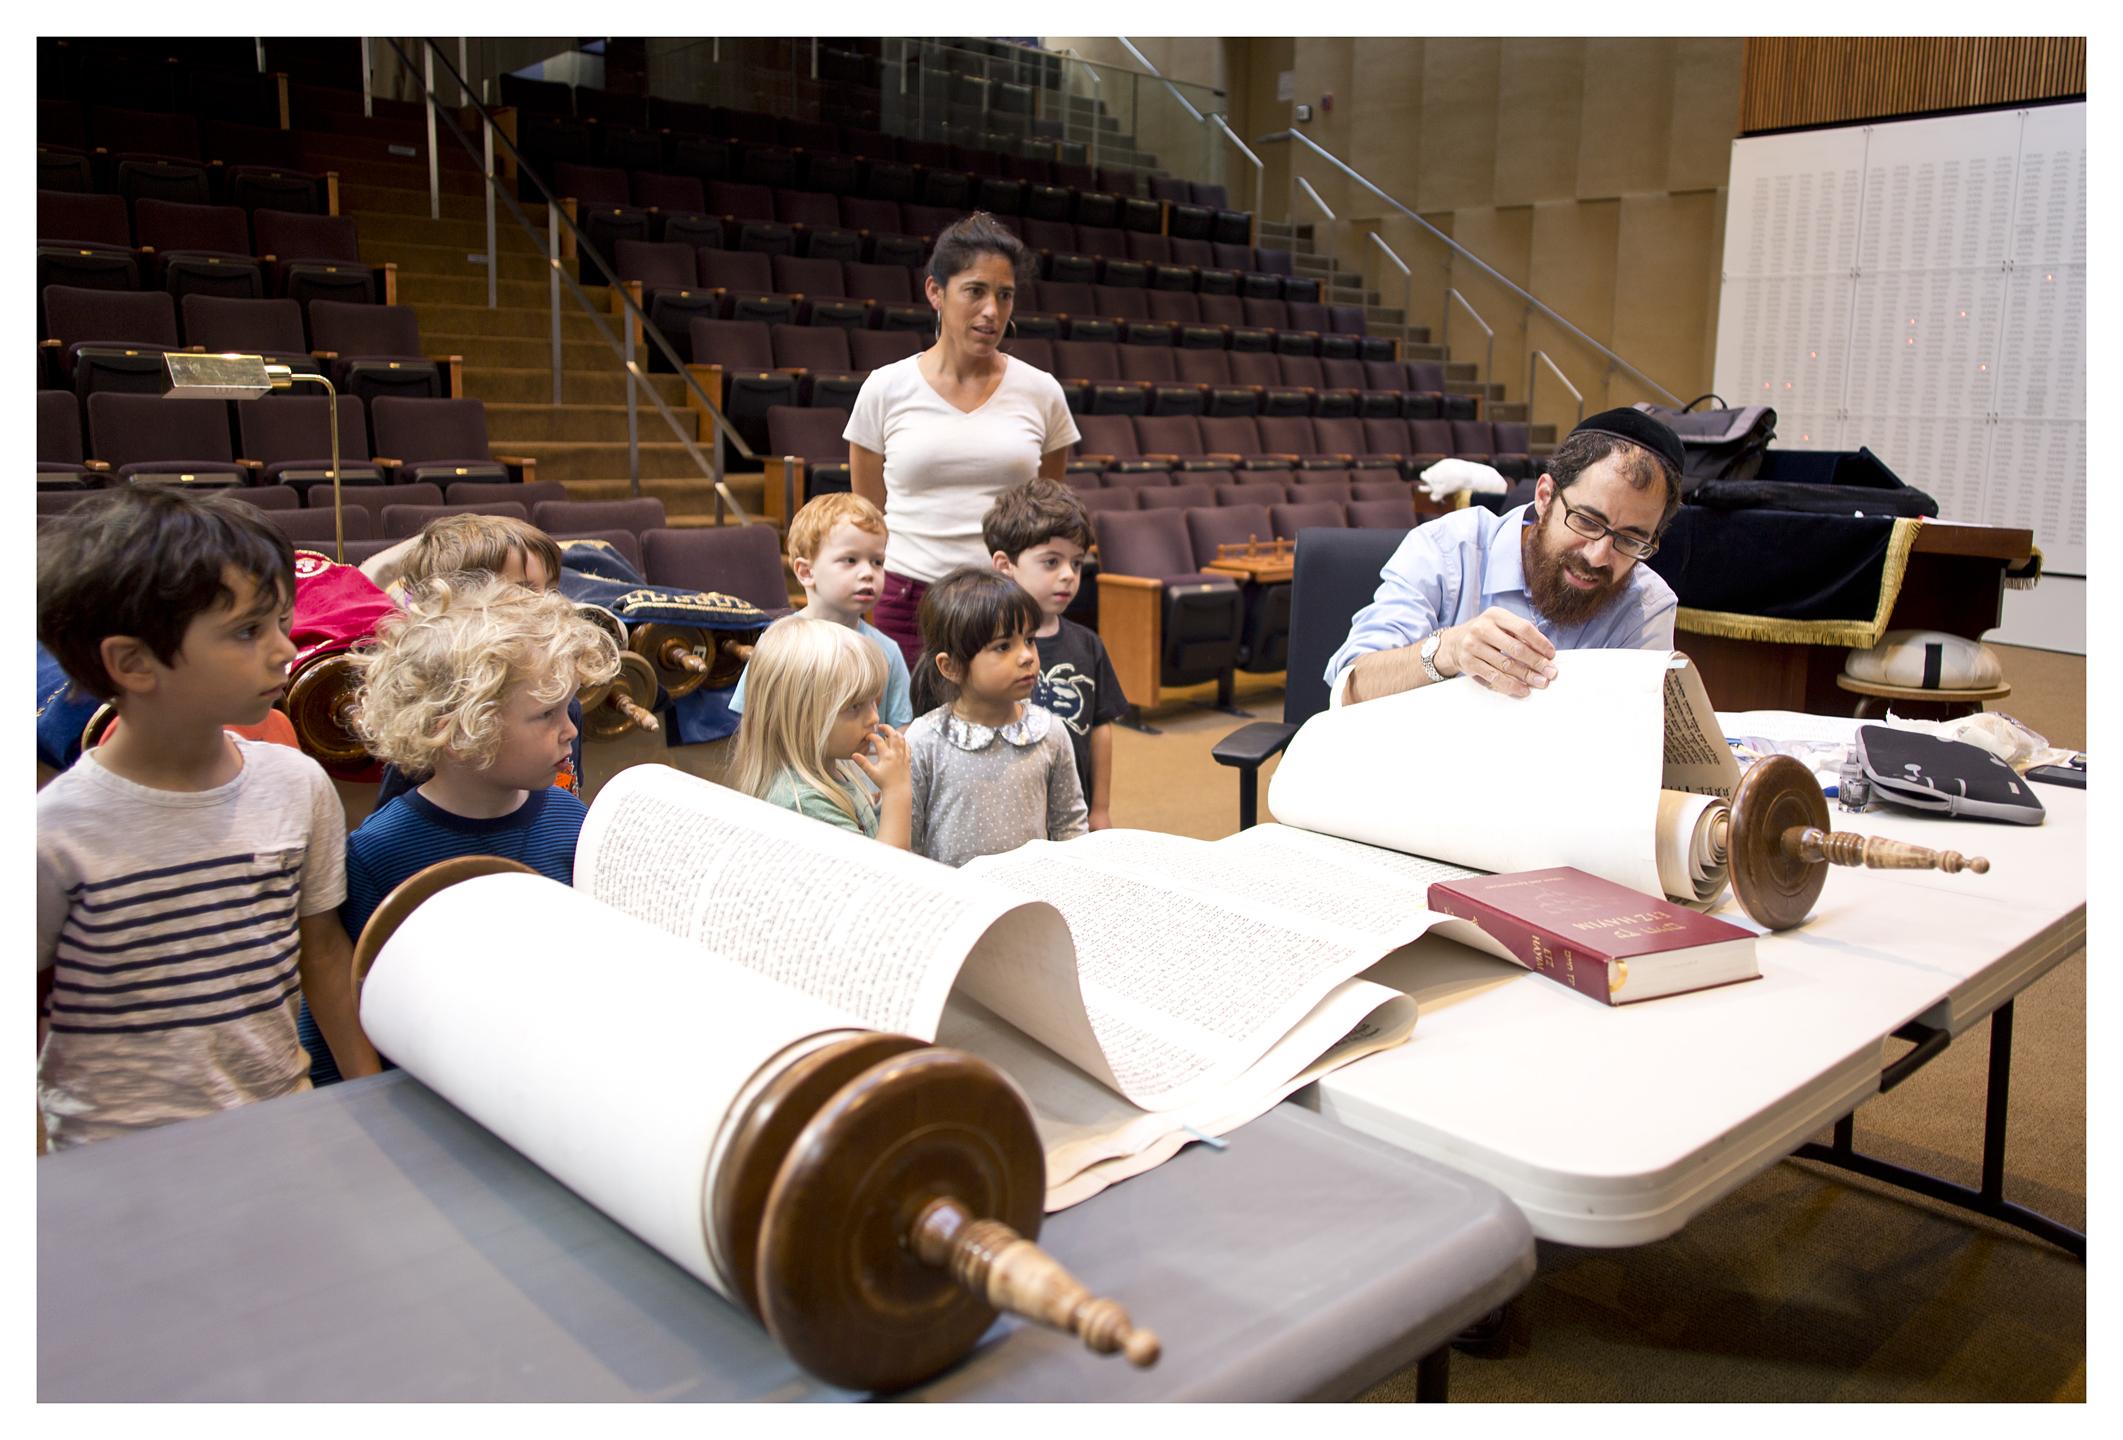 CBSPreschoolStudents&RabbiLeviSelwyn4_CongregationBethSholom_October2015